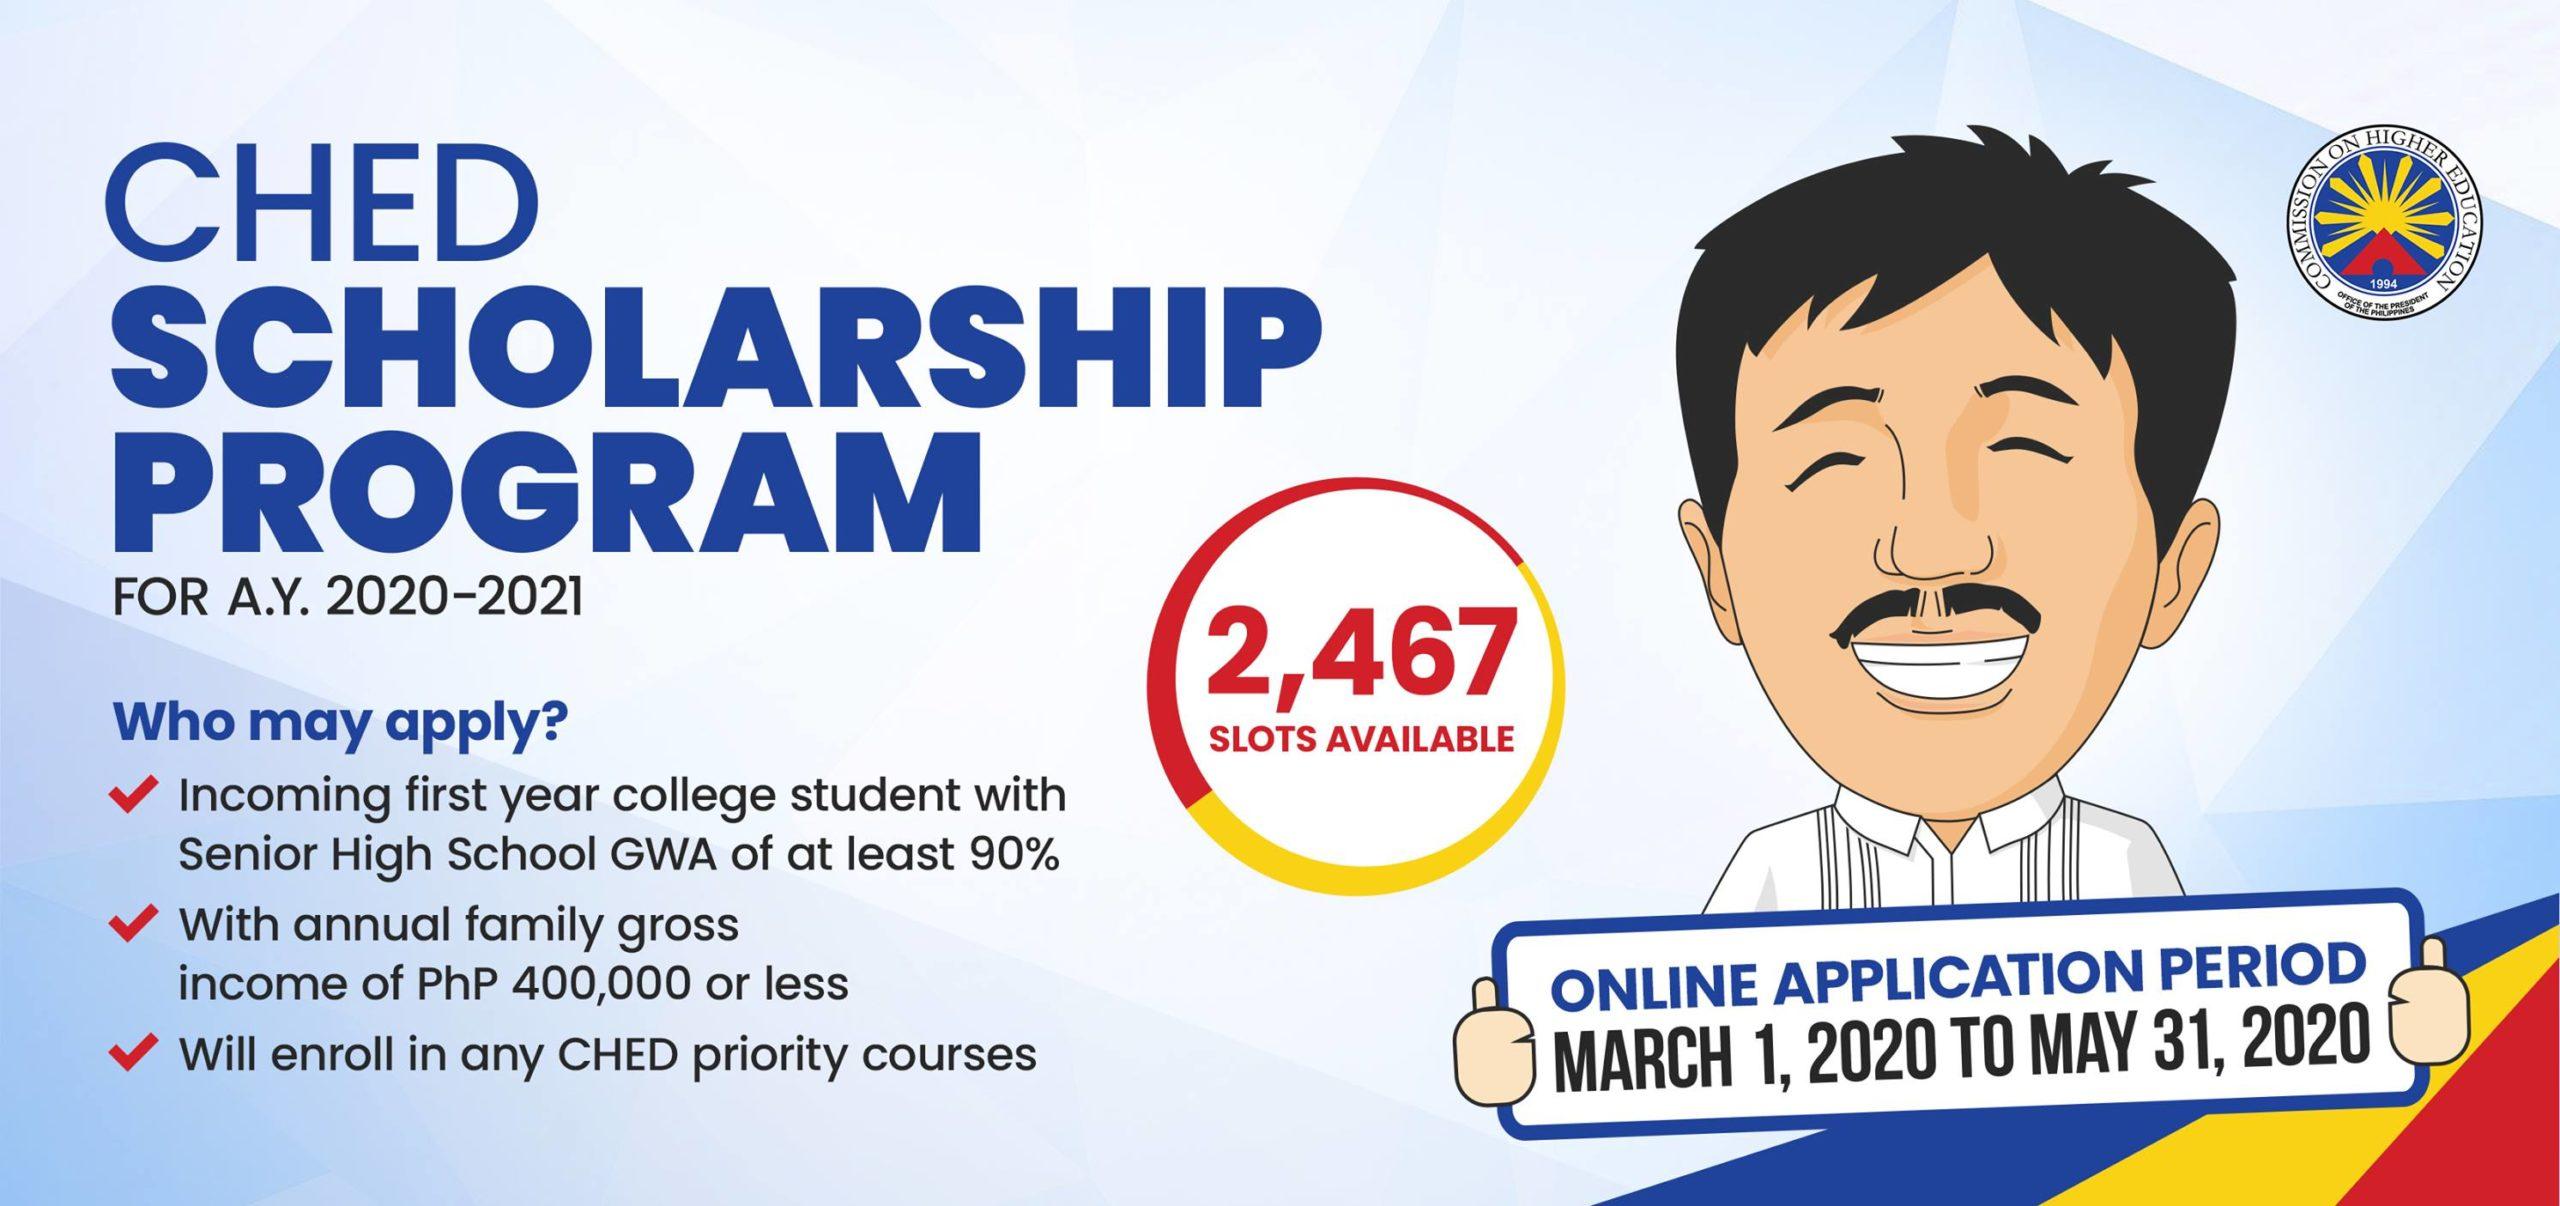 CHED Scholarship Program Details